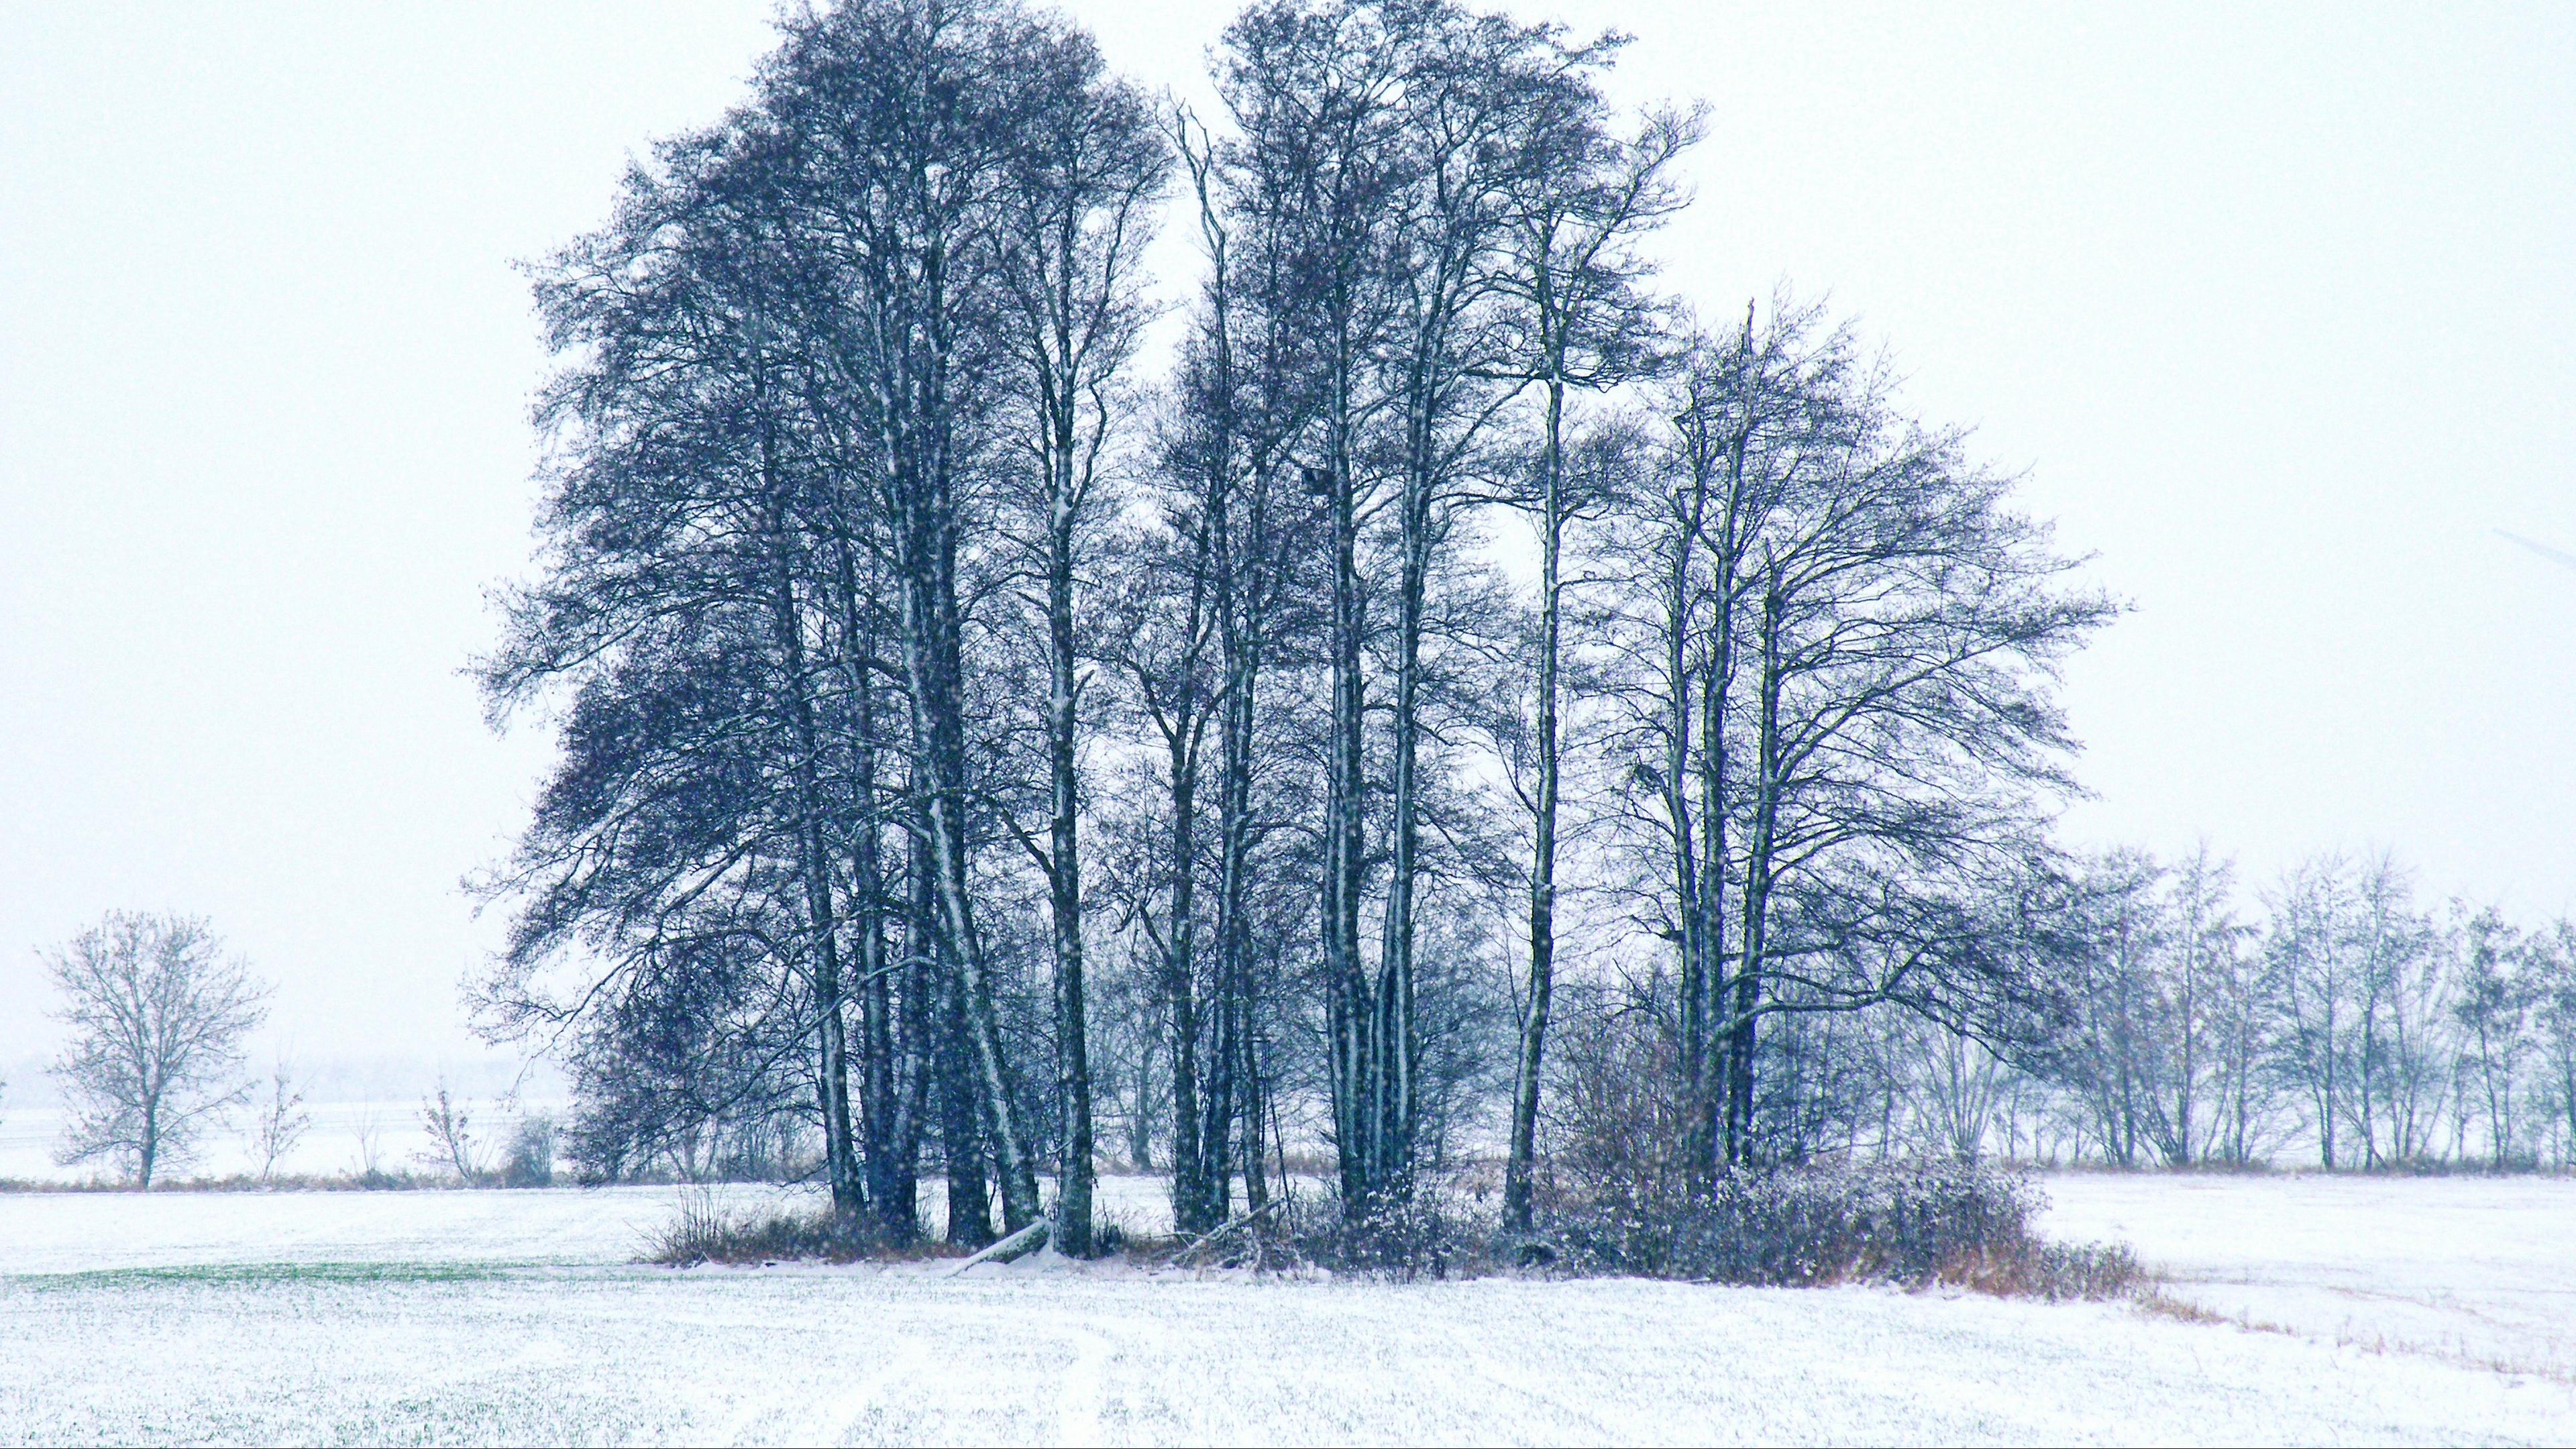 trees winter snow 4k 1541116555 - trees, winter, snow 4k - Winter, Trees, Snow